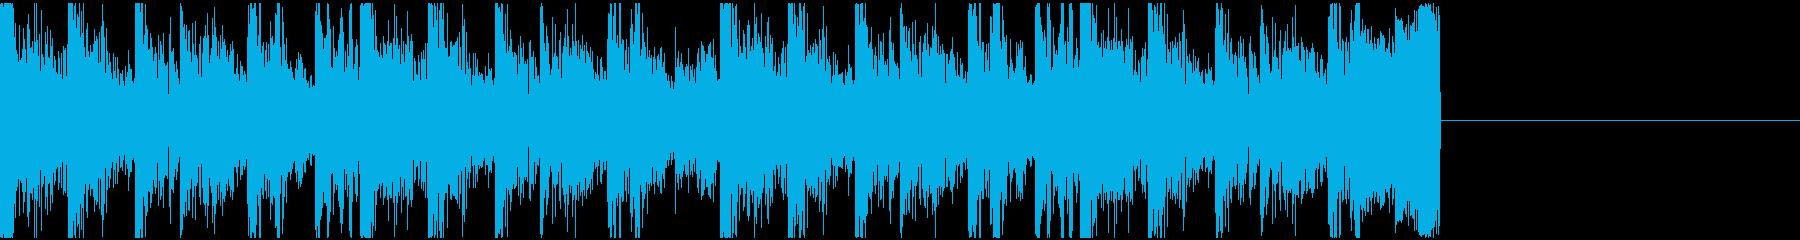 【JG】緊迫感のあるジングル03の再生済みの波形